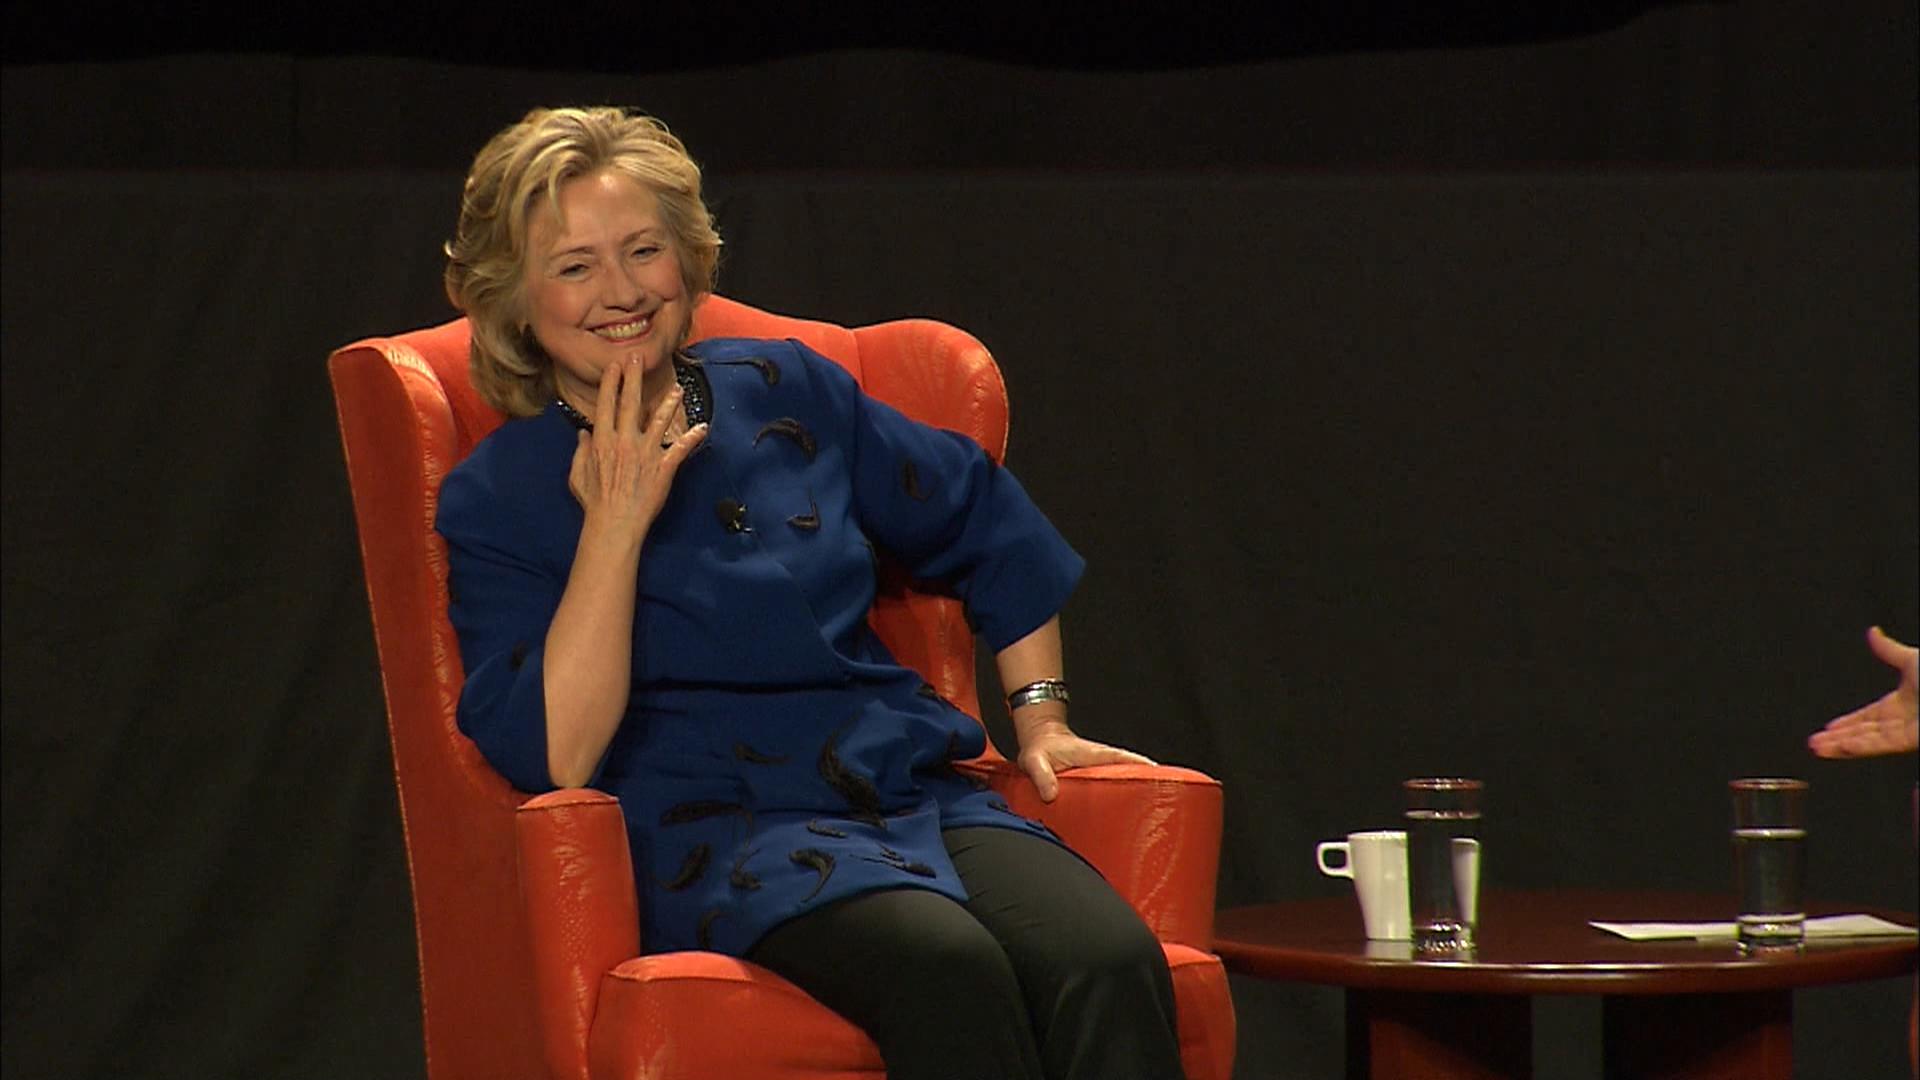 A peek into the Clinton X-files